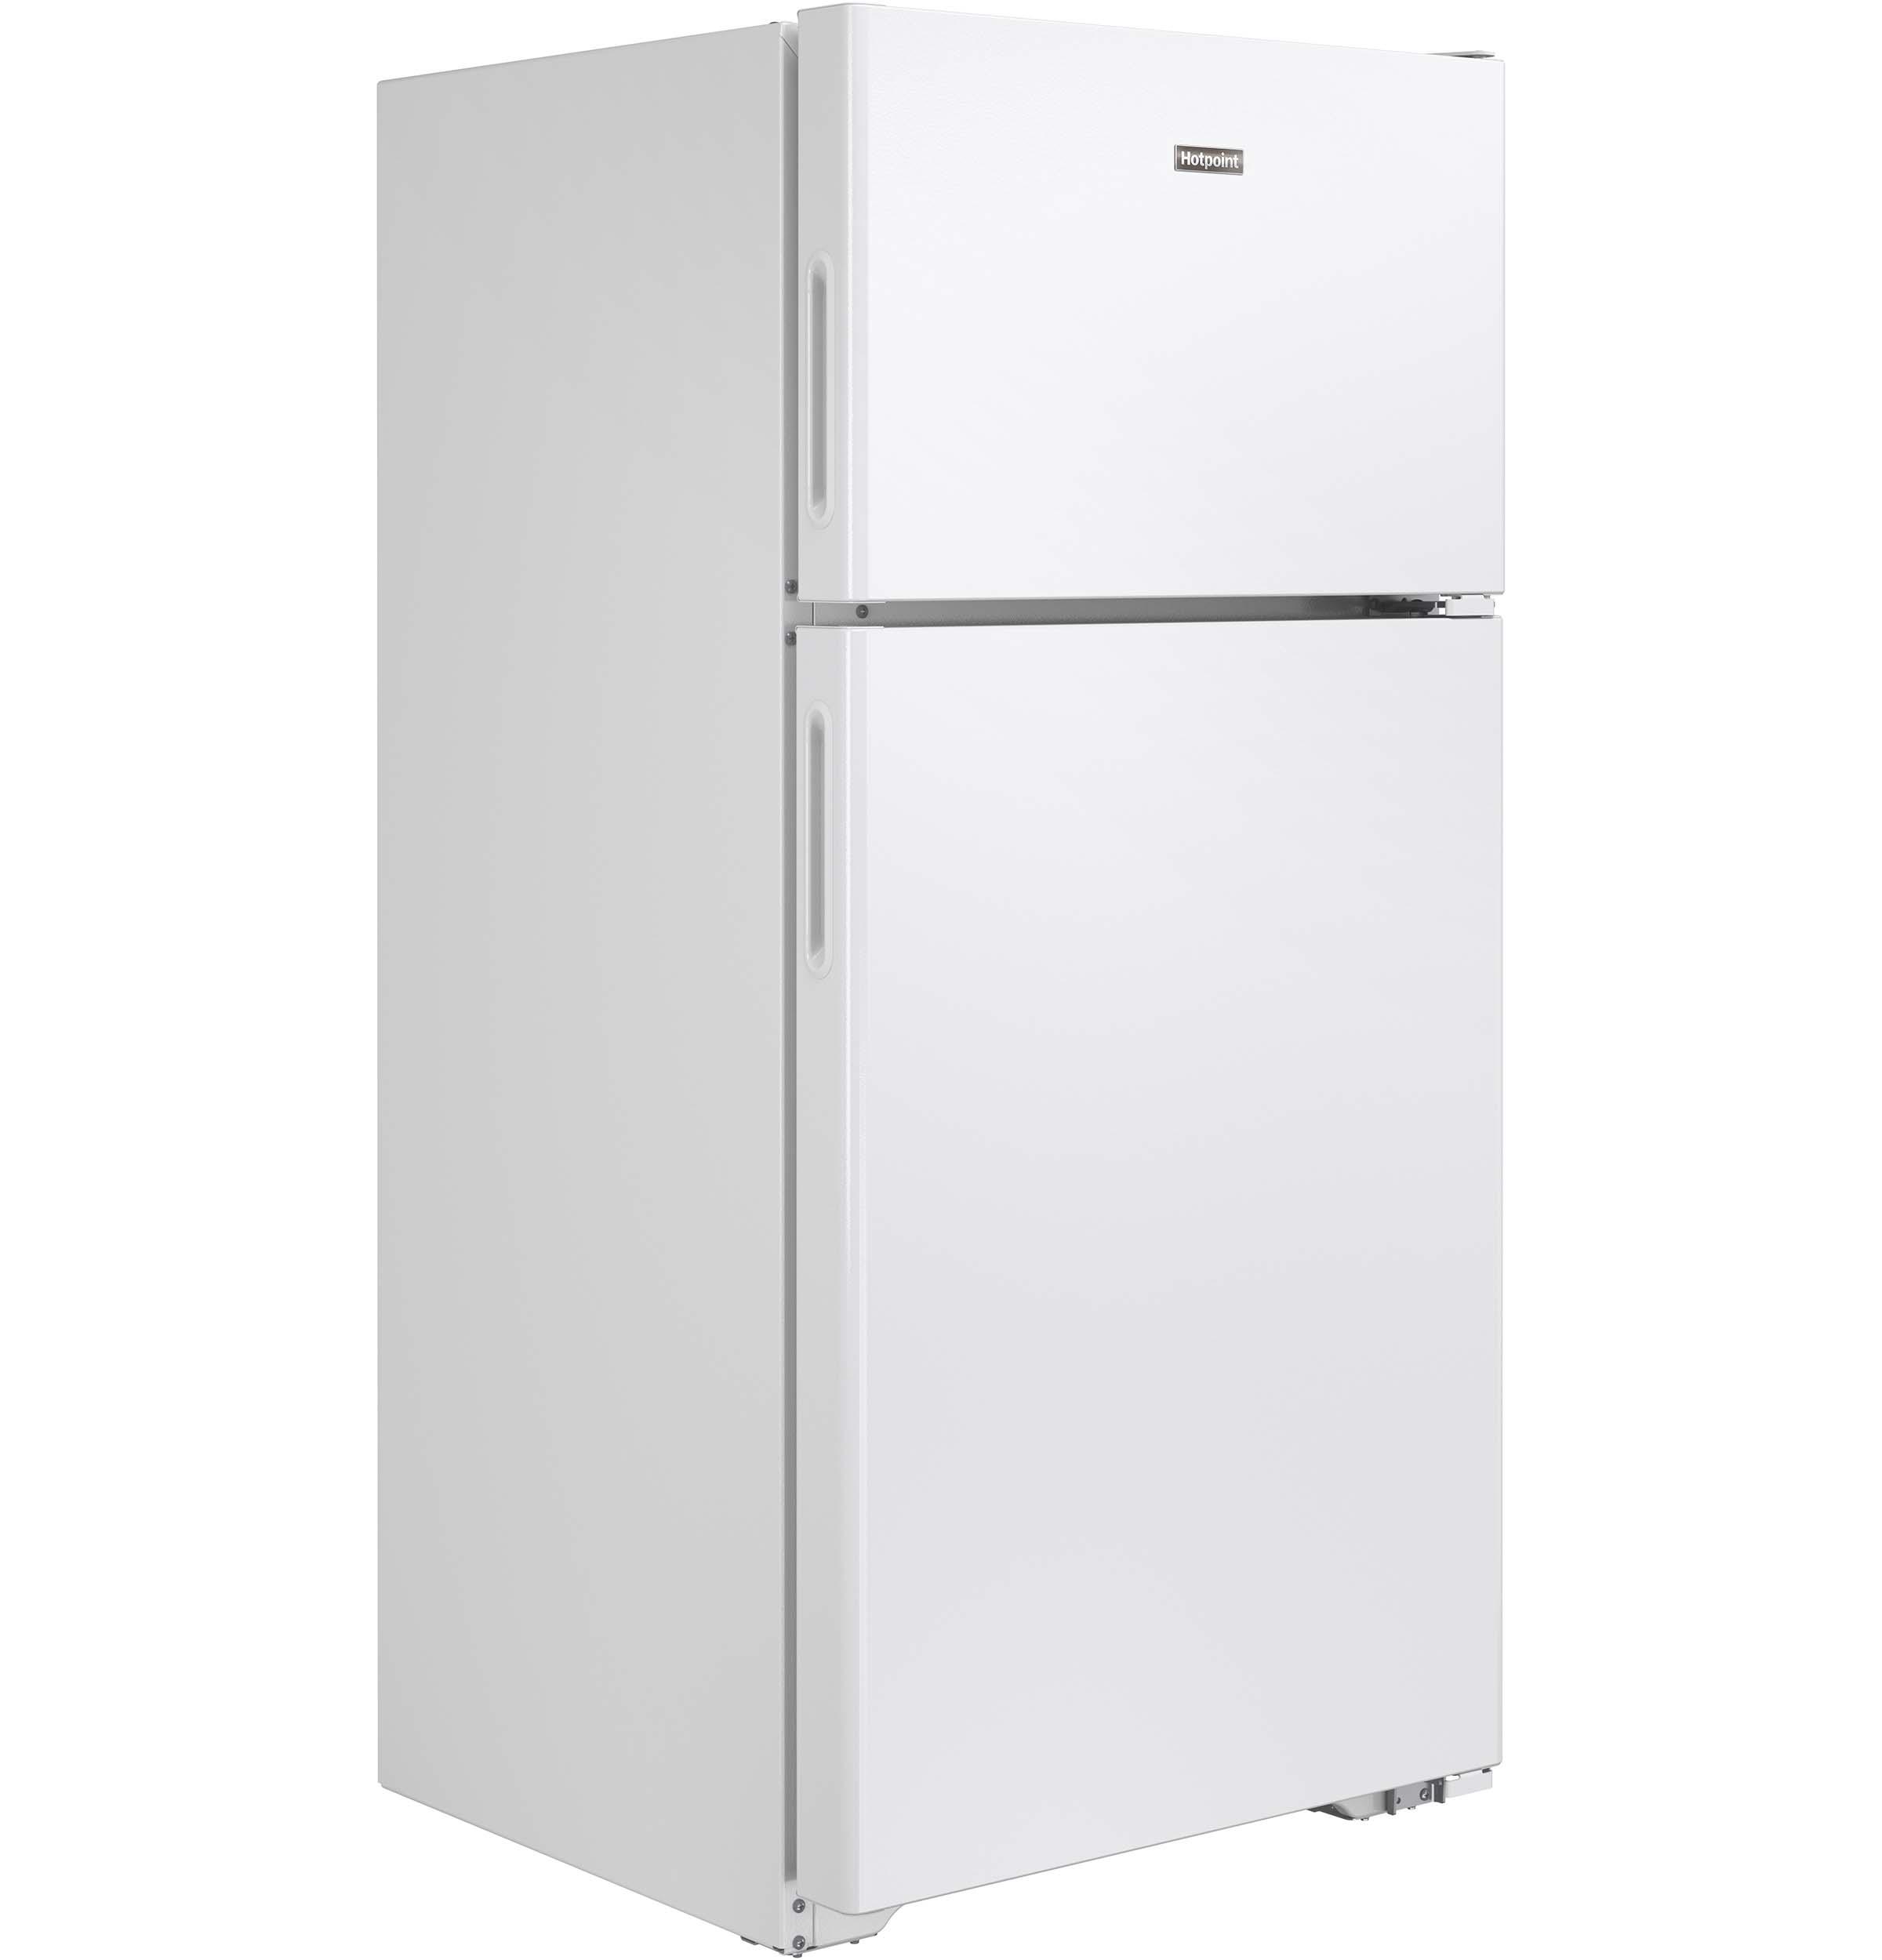 Model: HPS15BTHLWW | Hotpoint® 14.6 Cu. Ft. Recessed Handle Top-Freezer Refrigerator